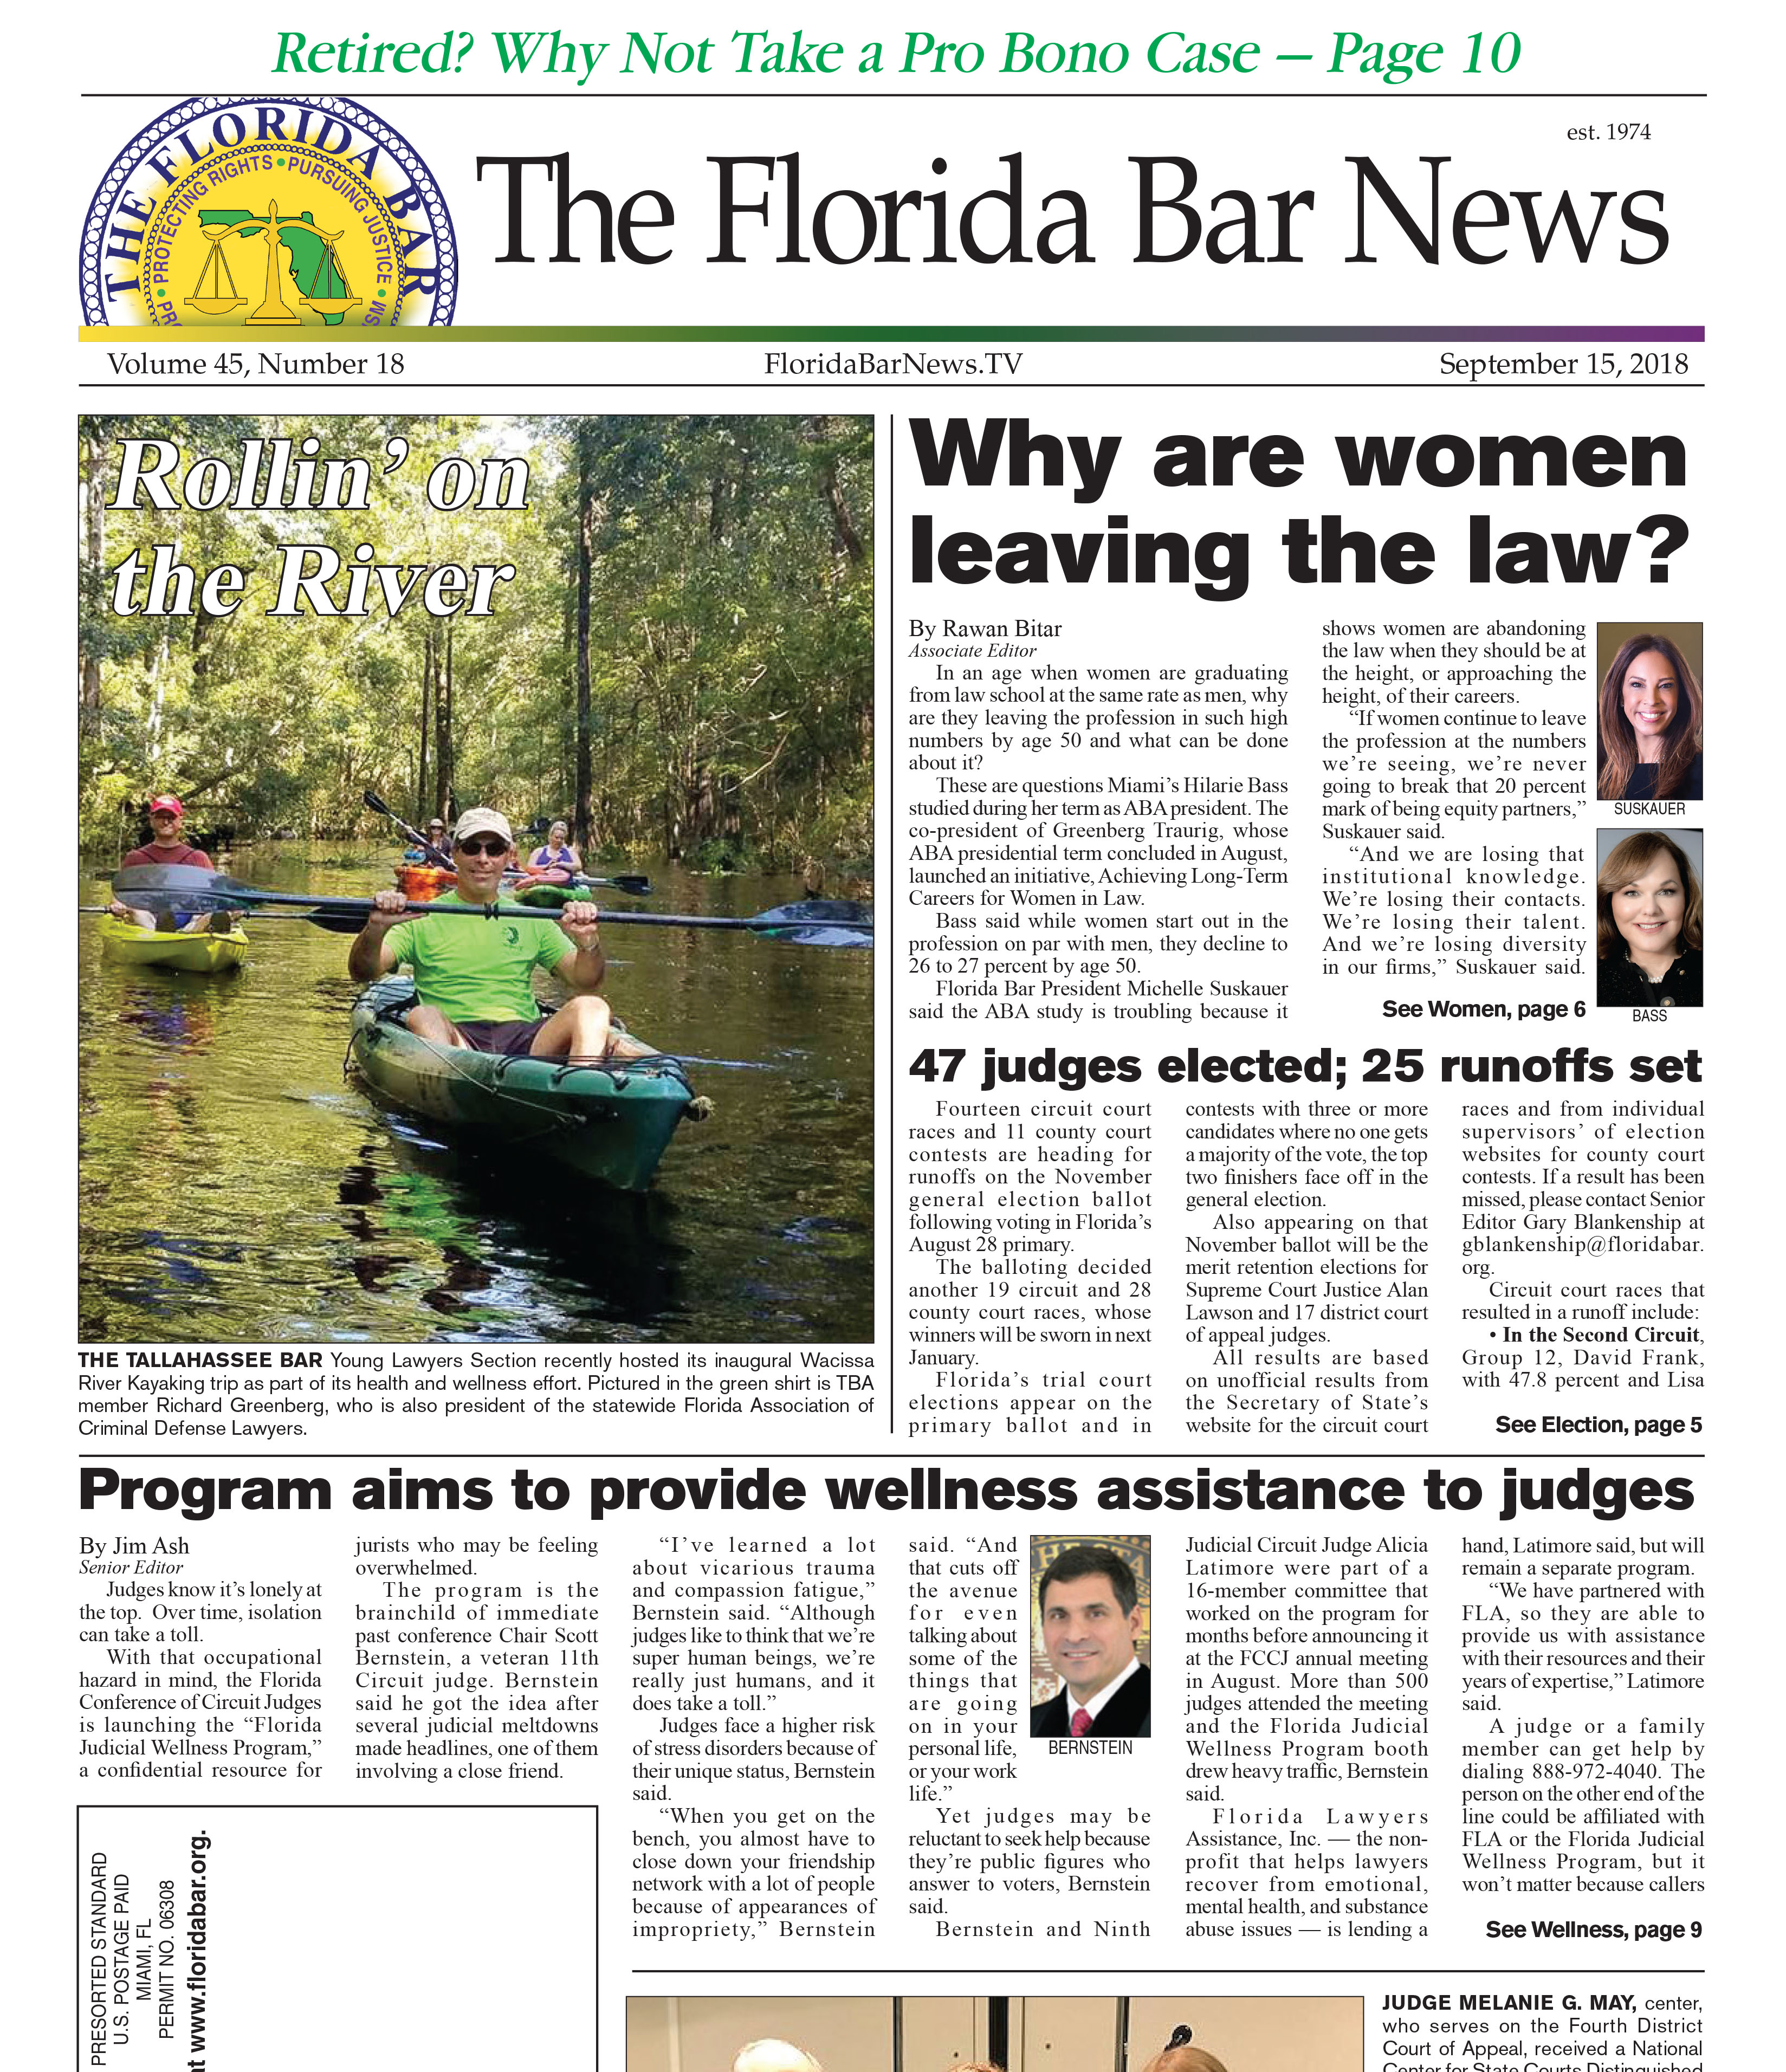 The Florida Bar News September 15, 2018